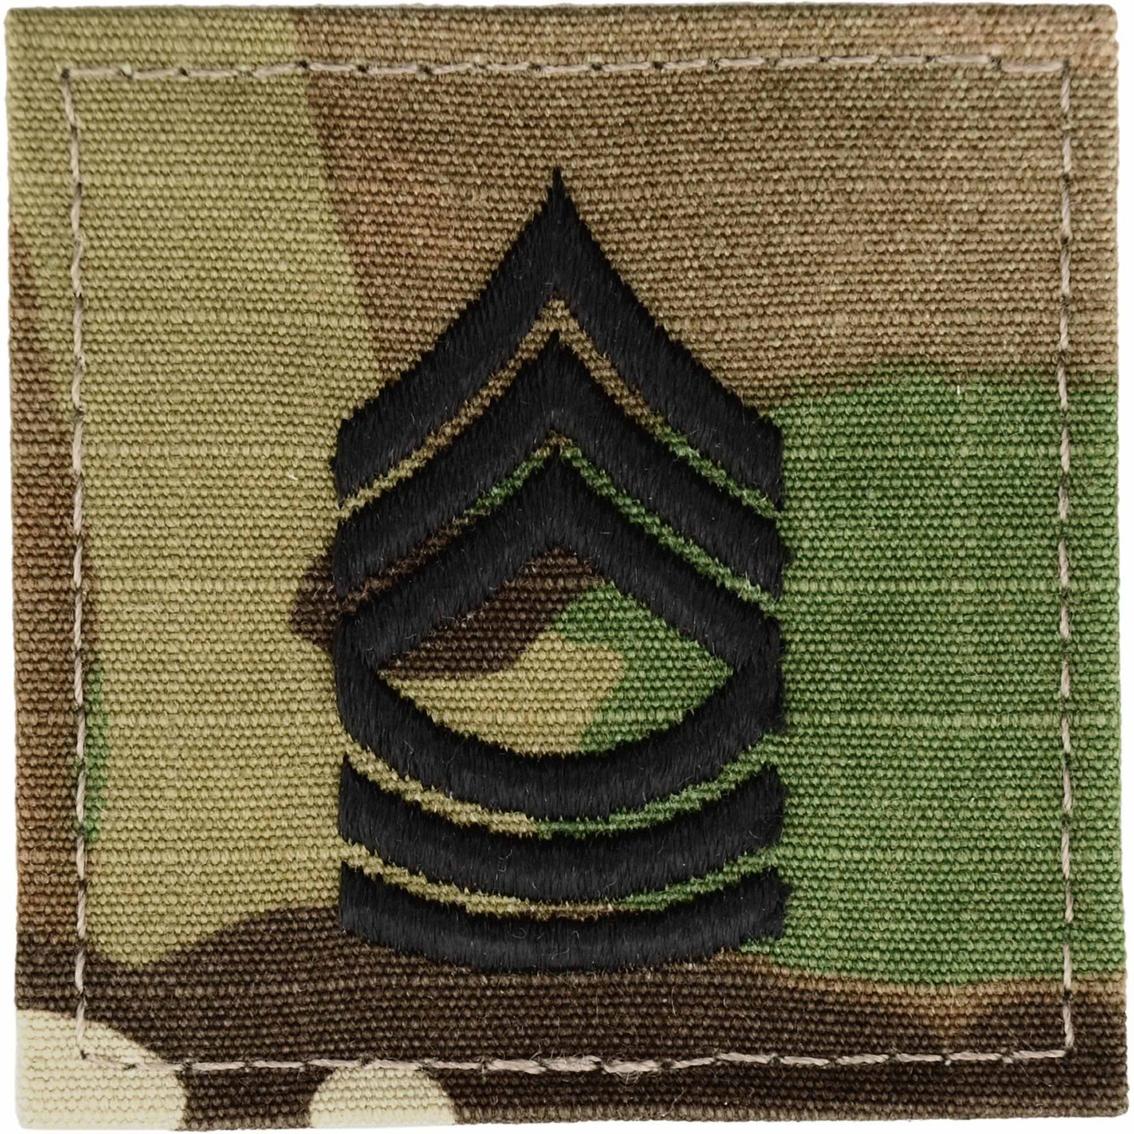 Army Rank Master Sergeant (msg) Velcro (ocp), 2 Qty Per Pkg.